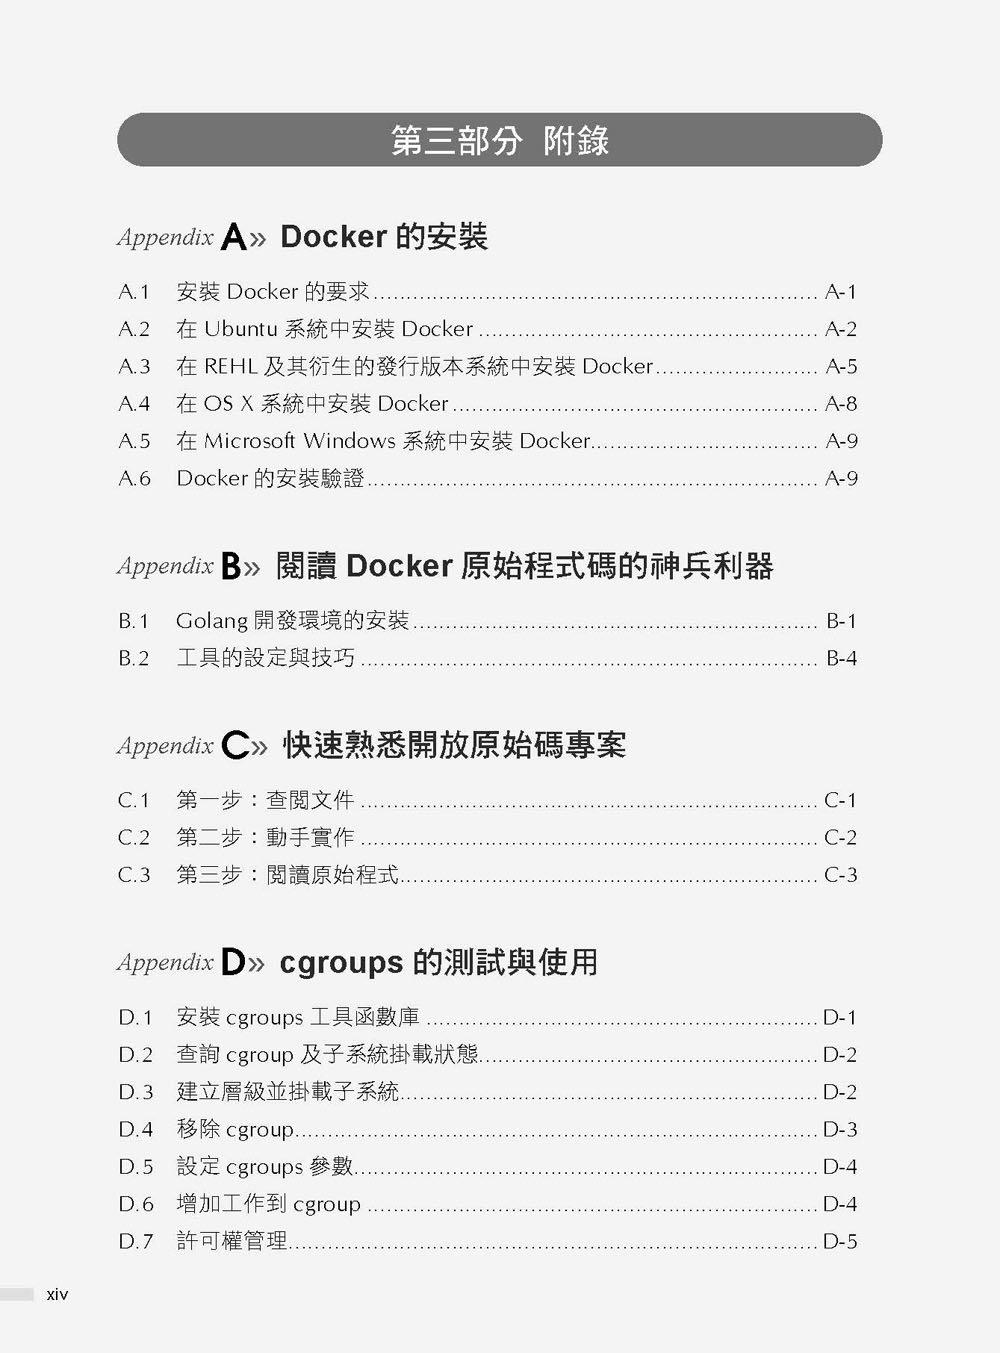 docker 雲端超容器絕佳利器 -- 終極高效輕量級虛擬化工具 (舊名: 比 VM 粒度更細的 Container 時代來臨 : 使用 Docker 不再需要架設系統, 2/e)-preview-5